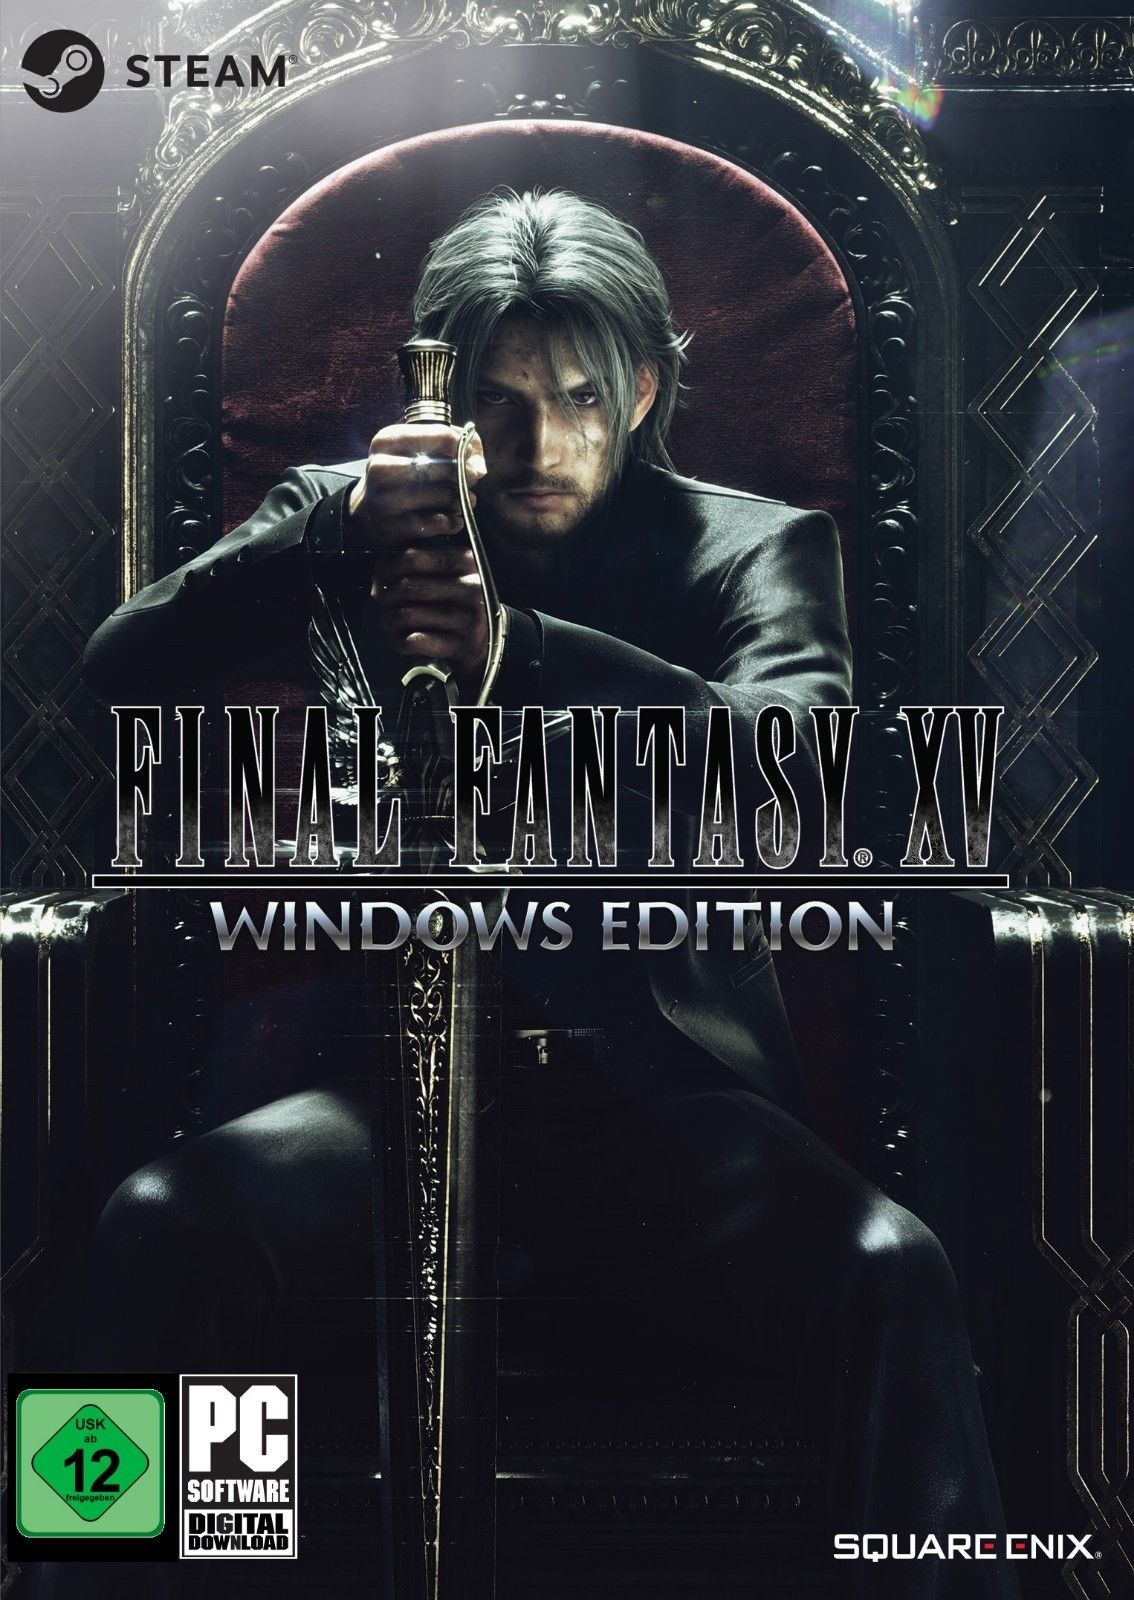 Final Fantasy XV windows edition PC Portada